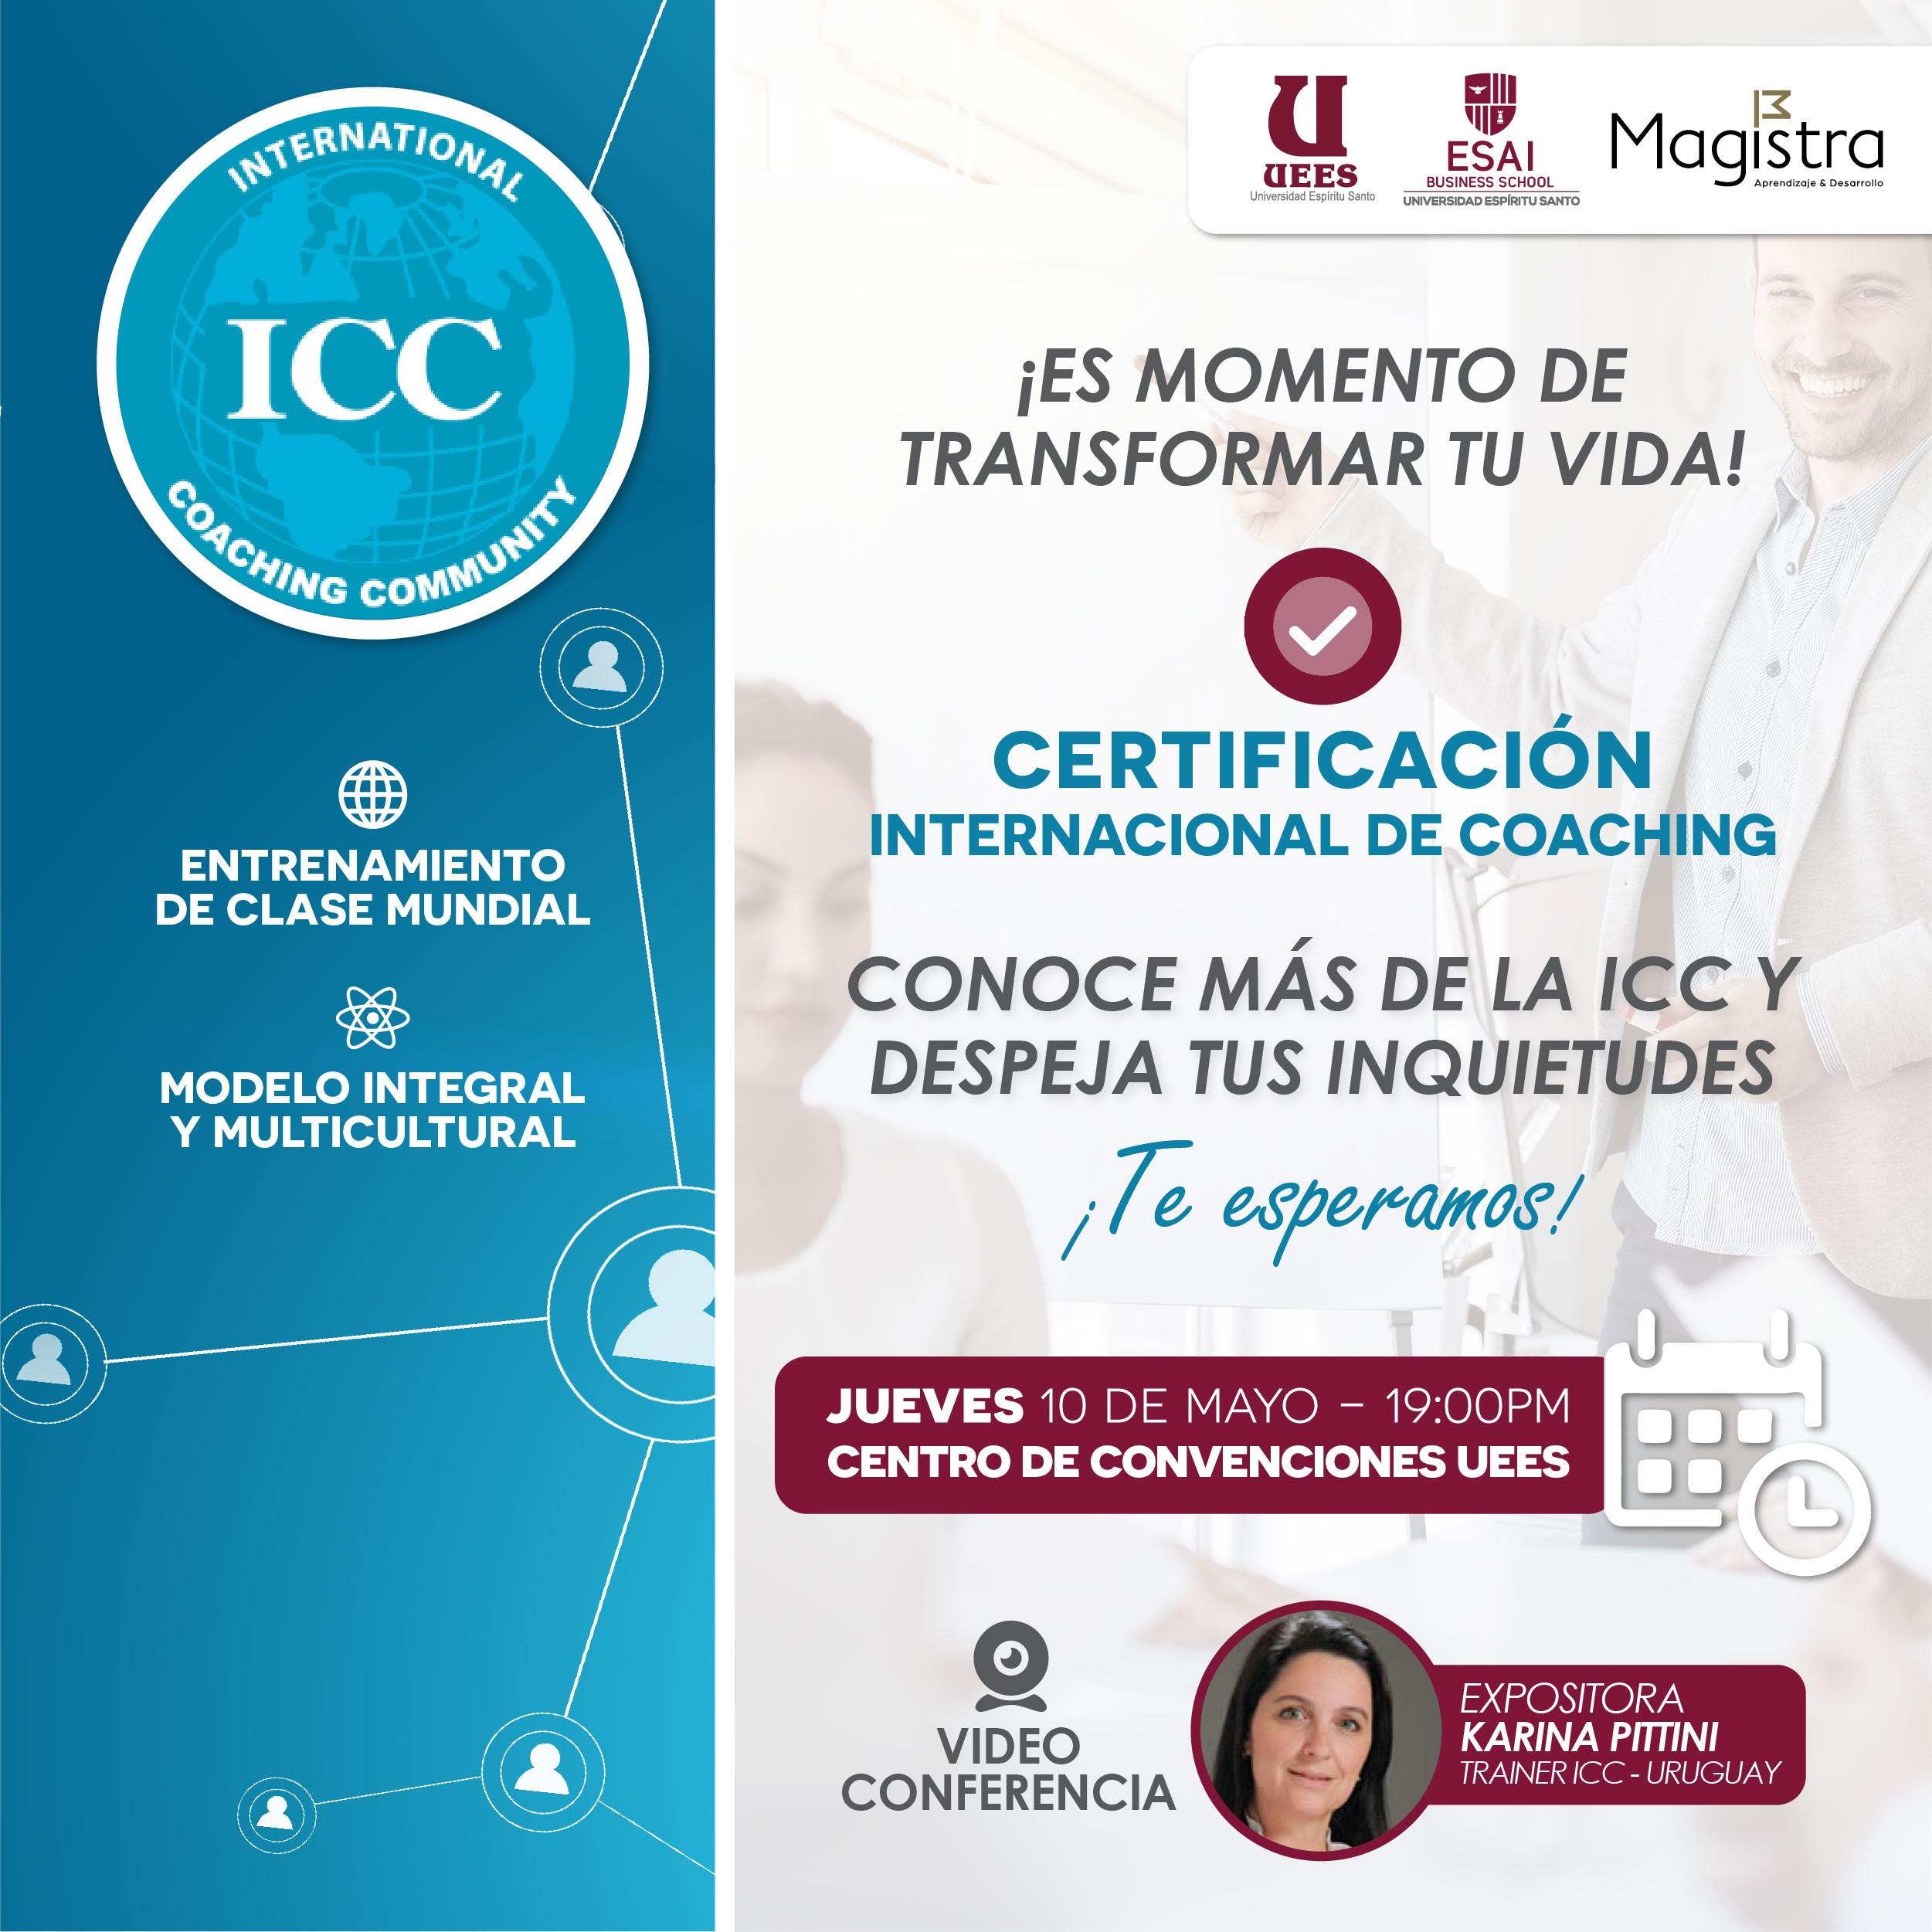 Invitaci_n_charla_informativa_certificaci_n_coaching